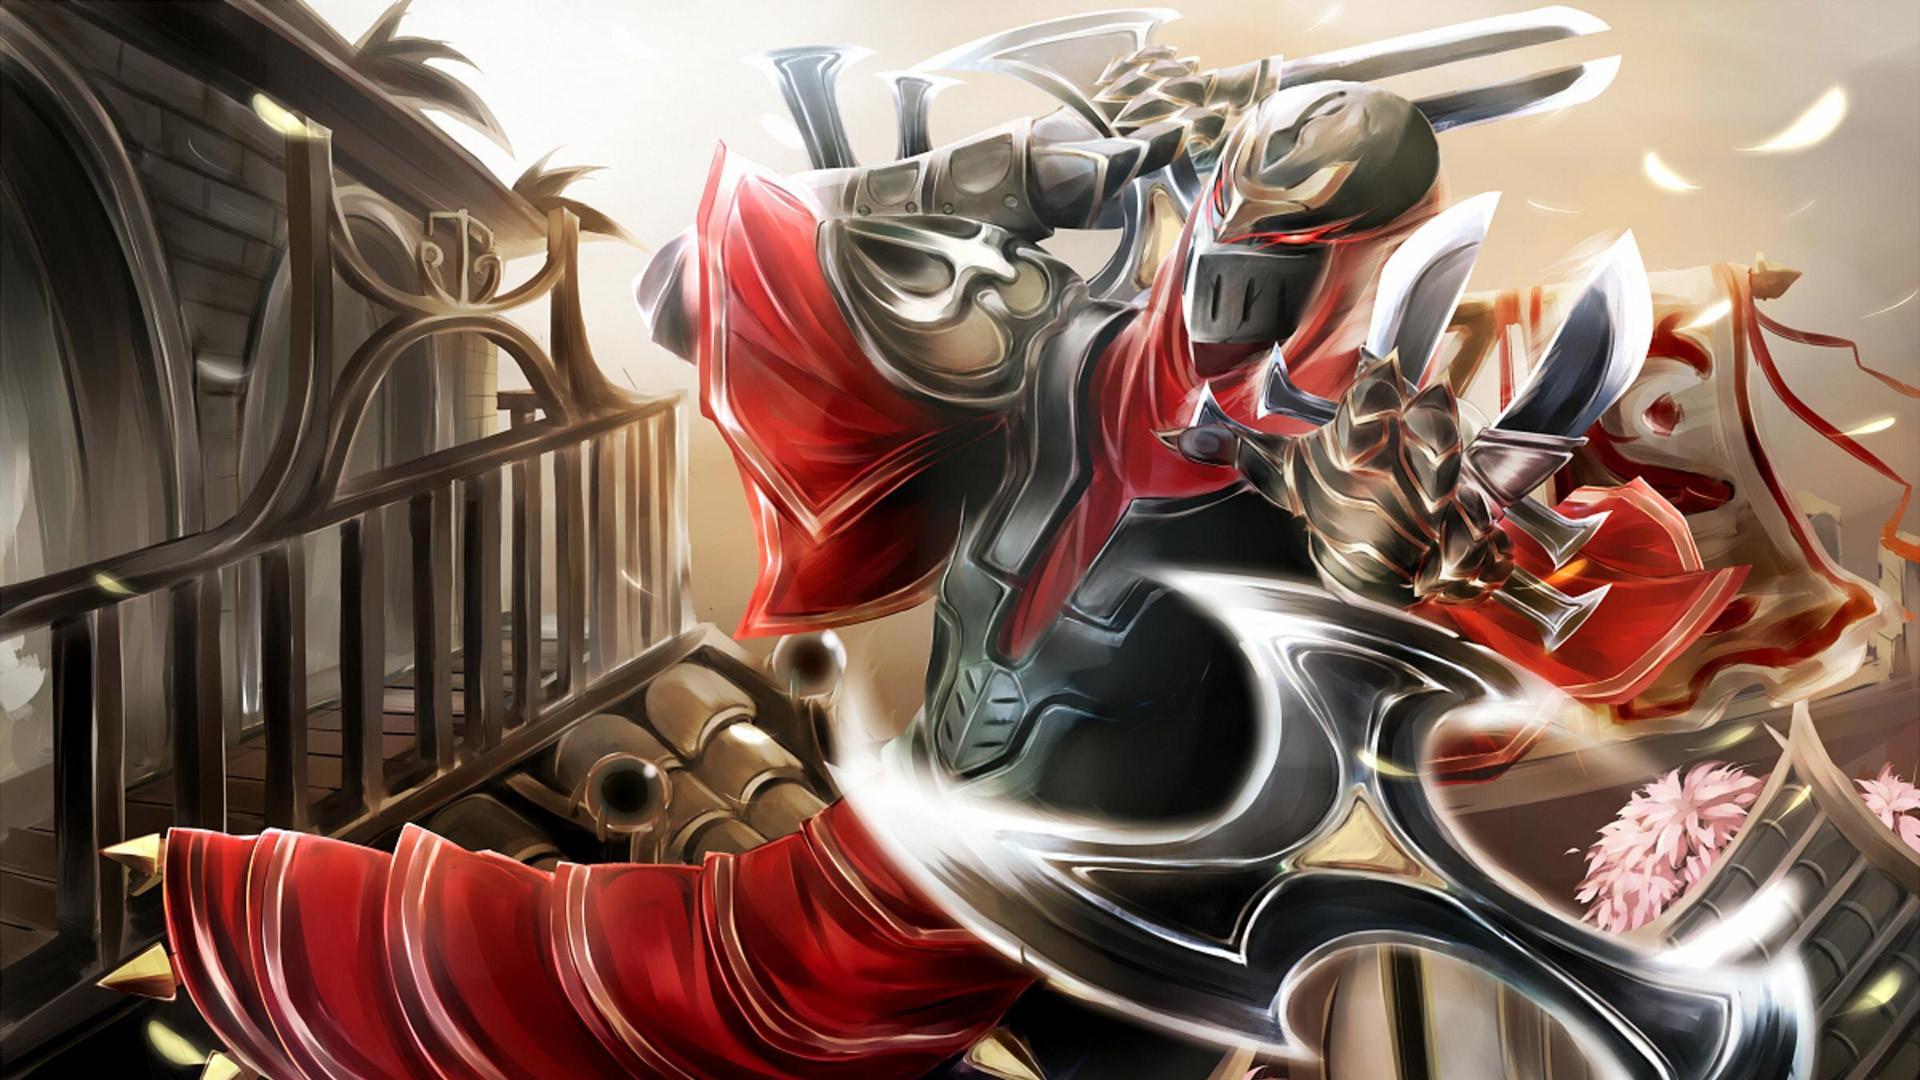 League Of Legends HD Zed Wallpaper Free HD Desktop and Mobile Wallpaper